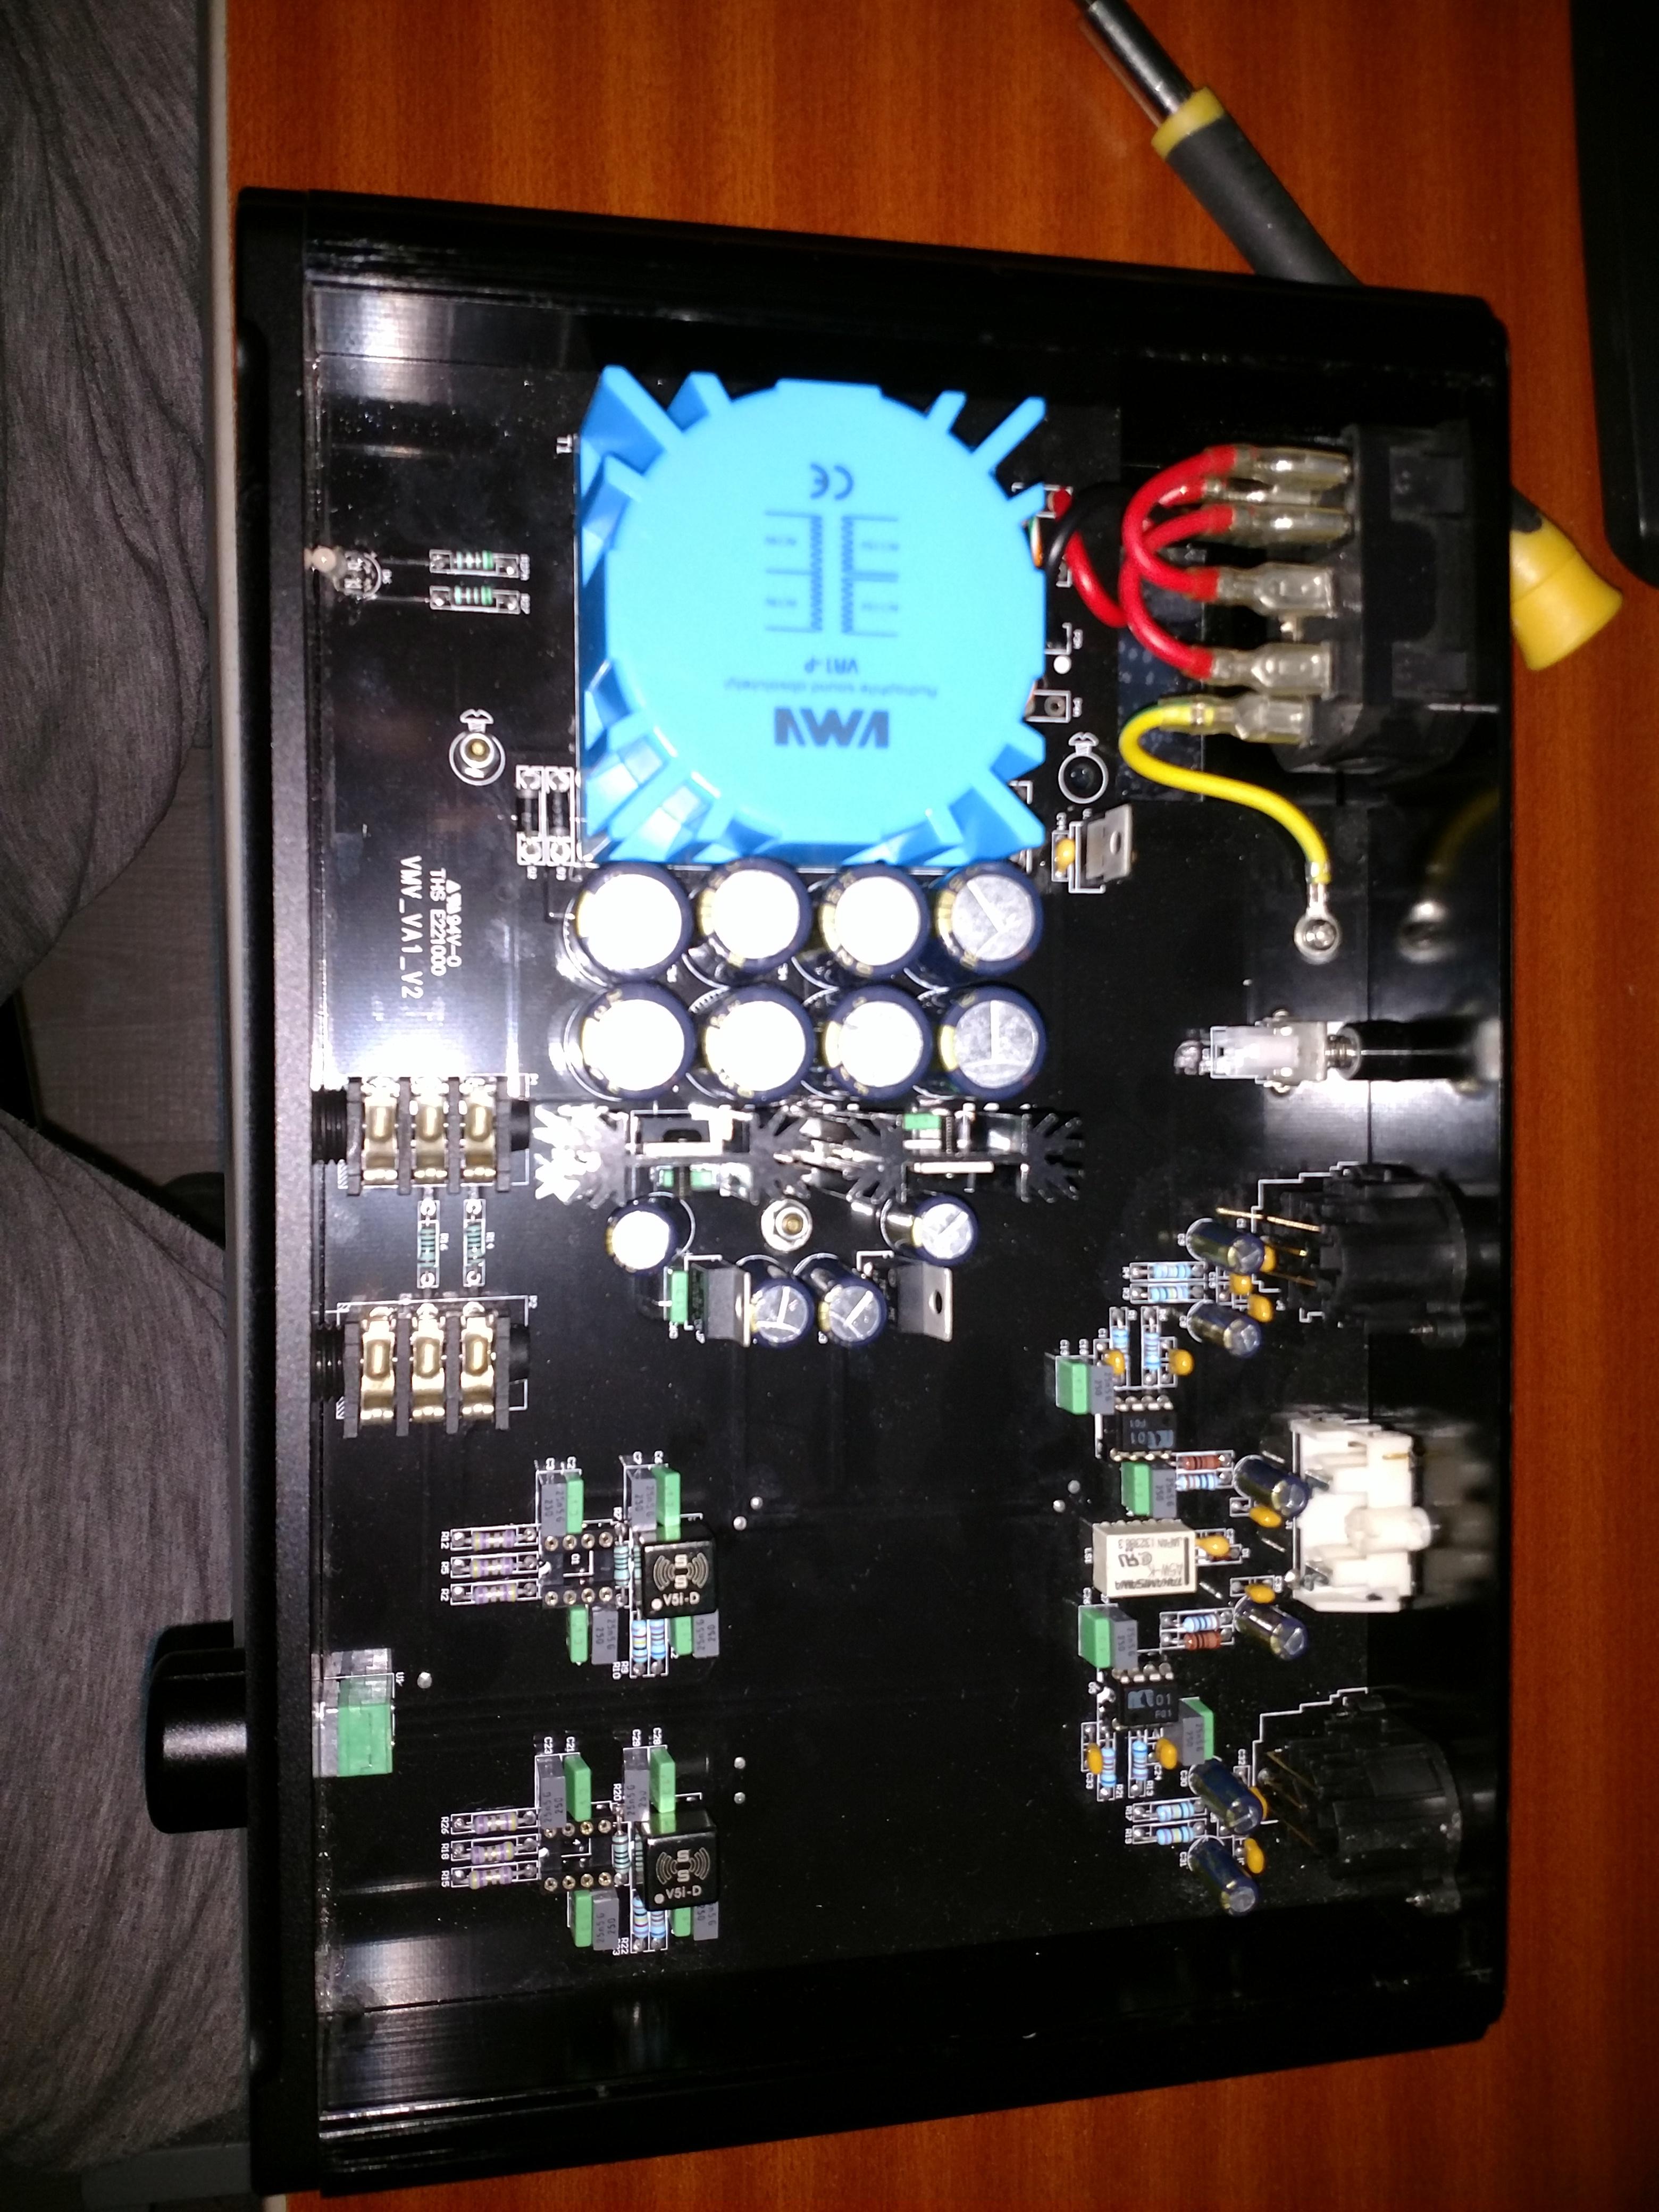 Burson Audio Supreme Sound Opamp V5i Reviews Page 3 Headphone Powerful Amplifier Using Opa134 Img 20180201 192040645